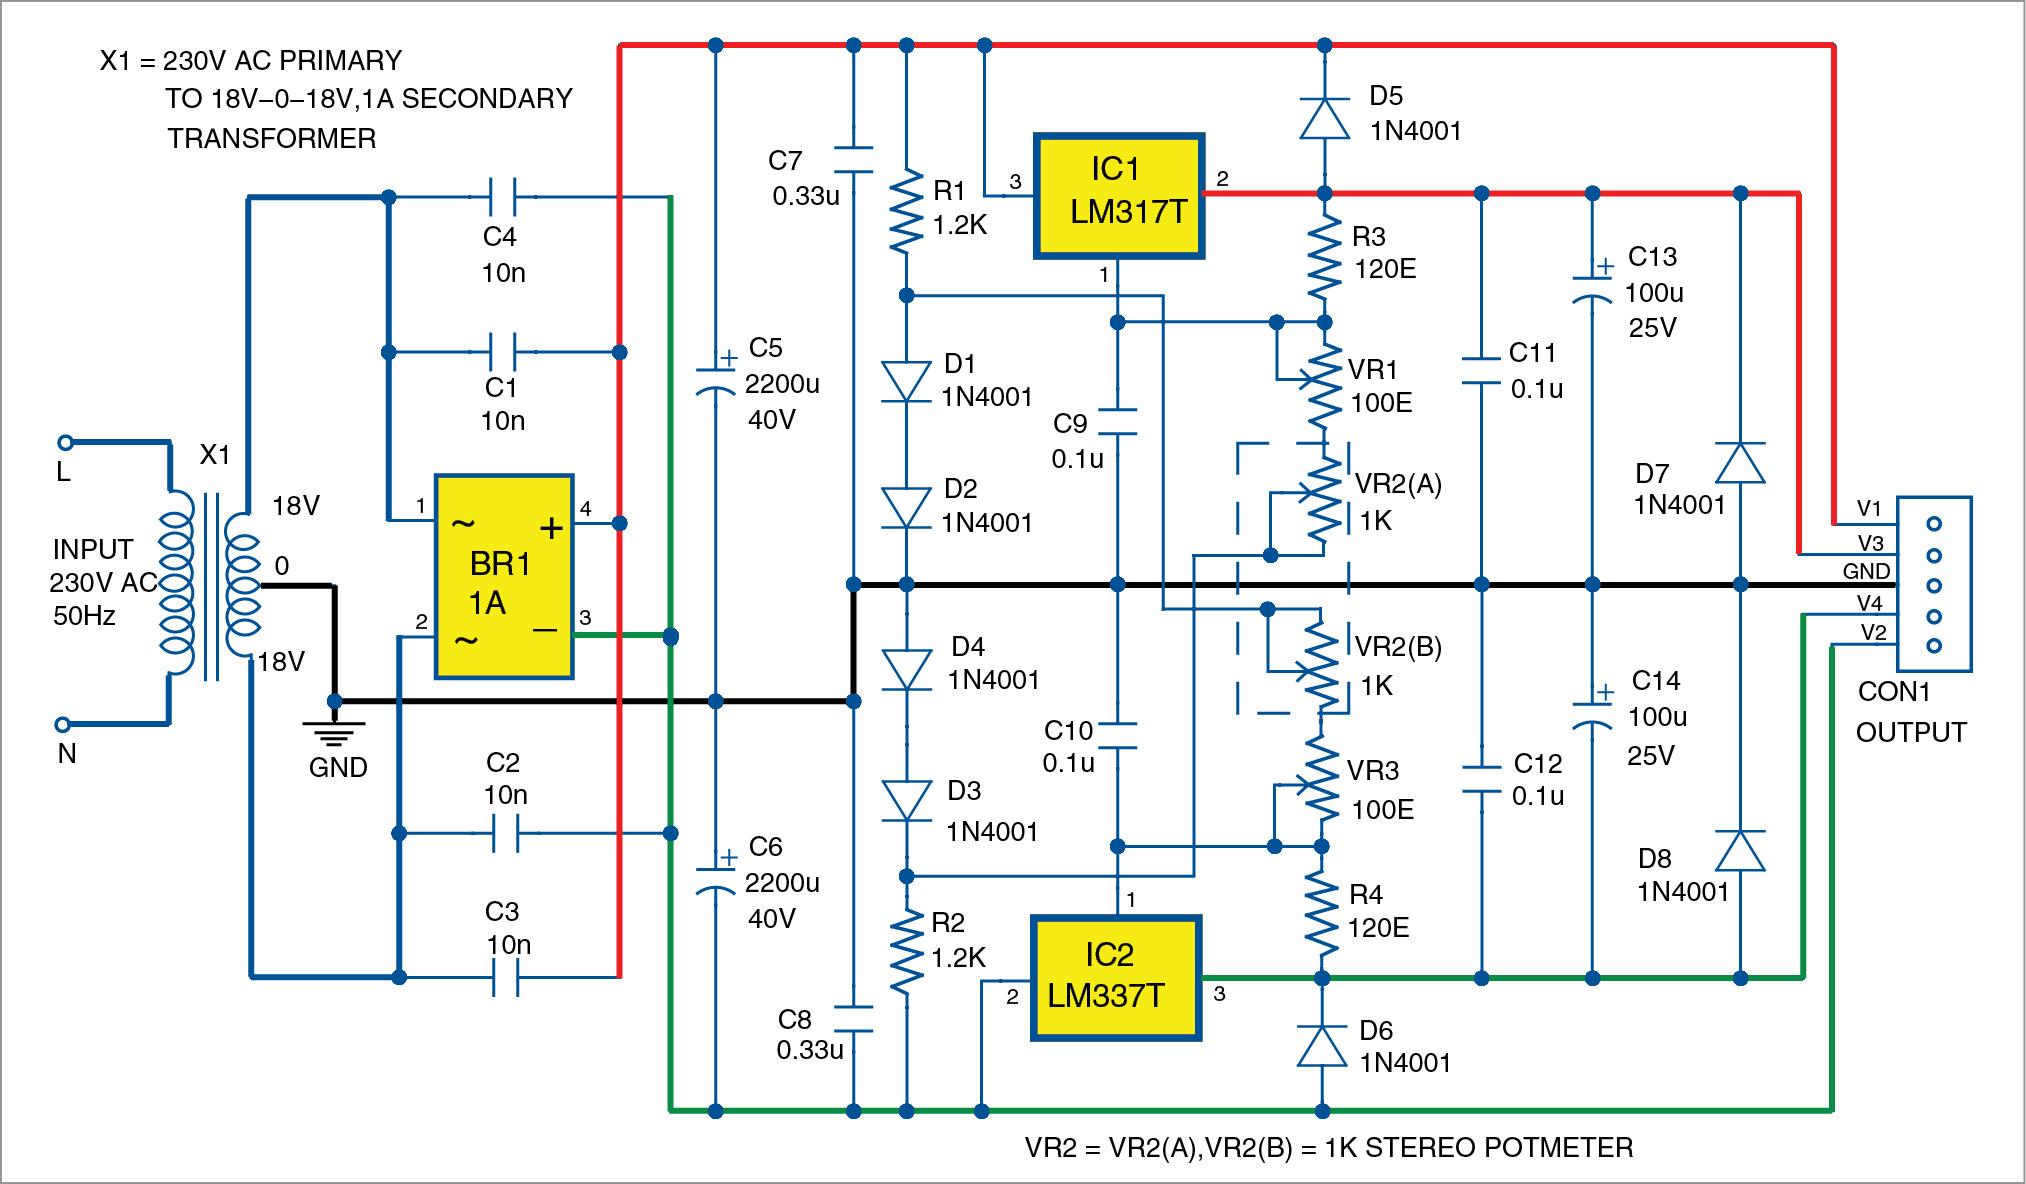 Bipolar Power Supply With Adjustable Regulators Electronics Project Constant Current Drives Two 3 Watt Ledselectronics Circuts